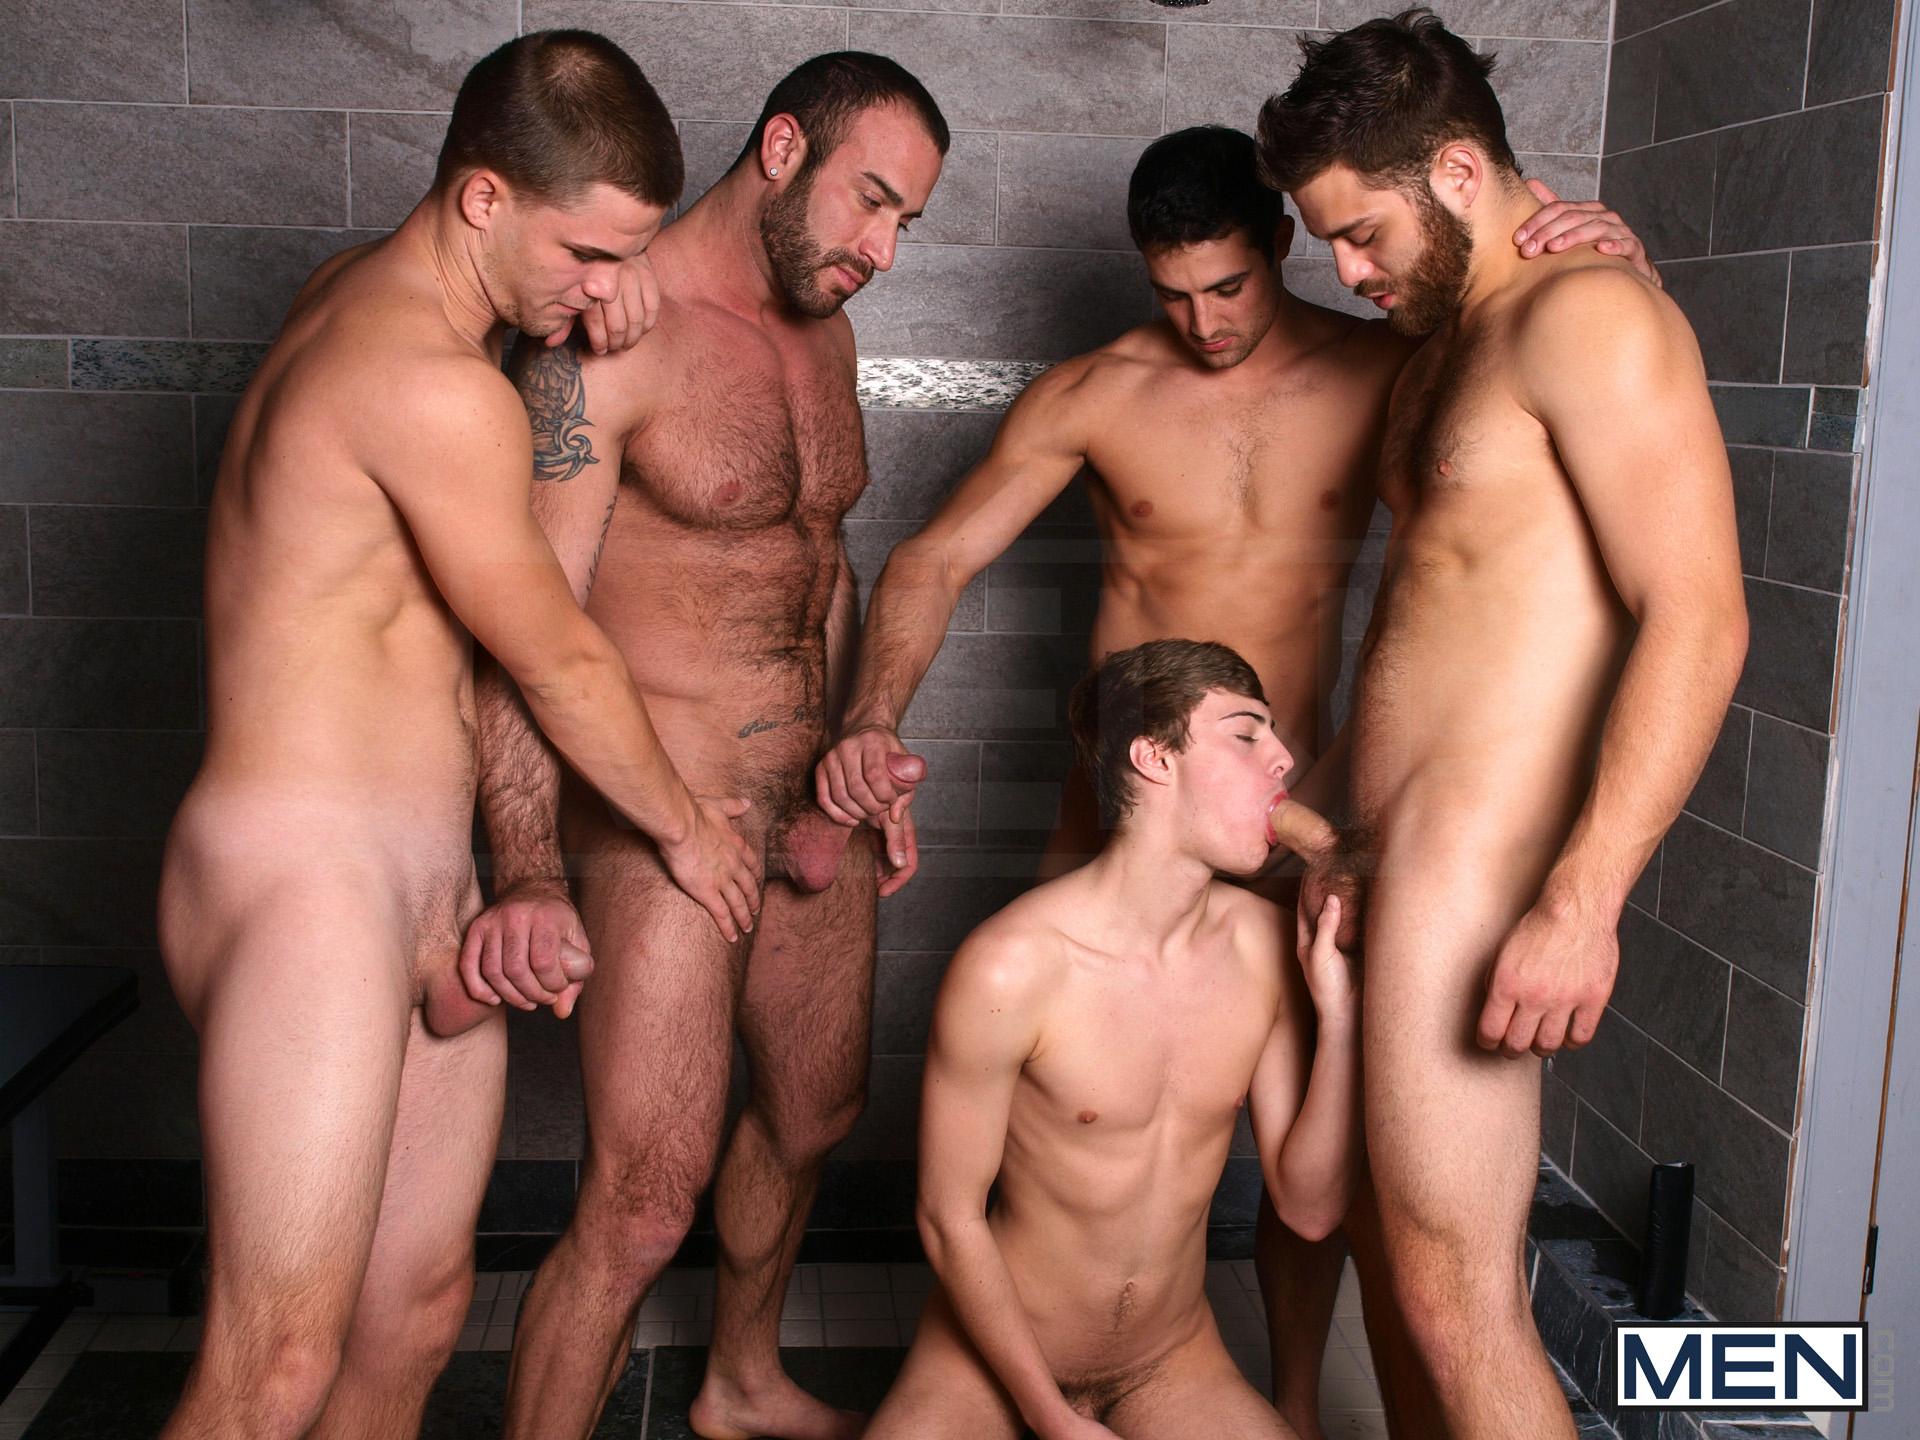 Секс онлайн гомосексуал оргия 25 фотография